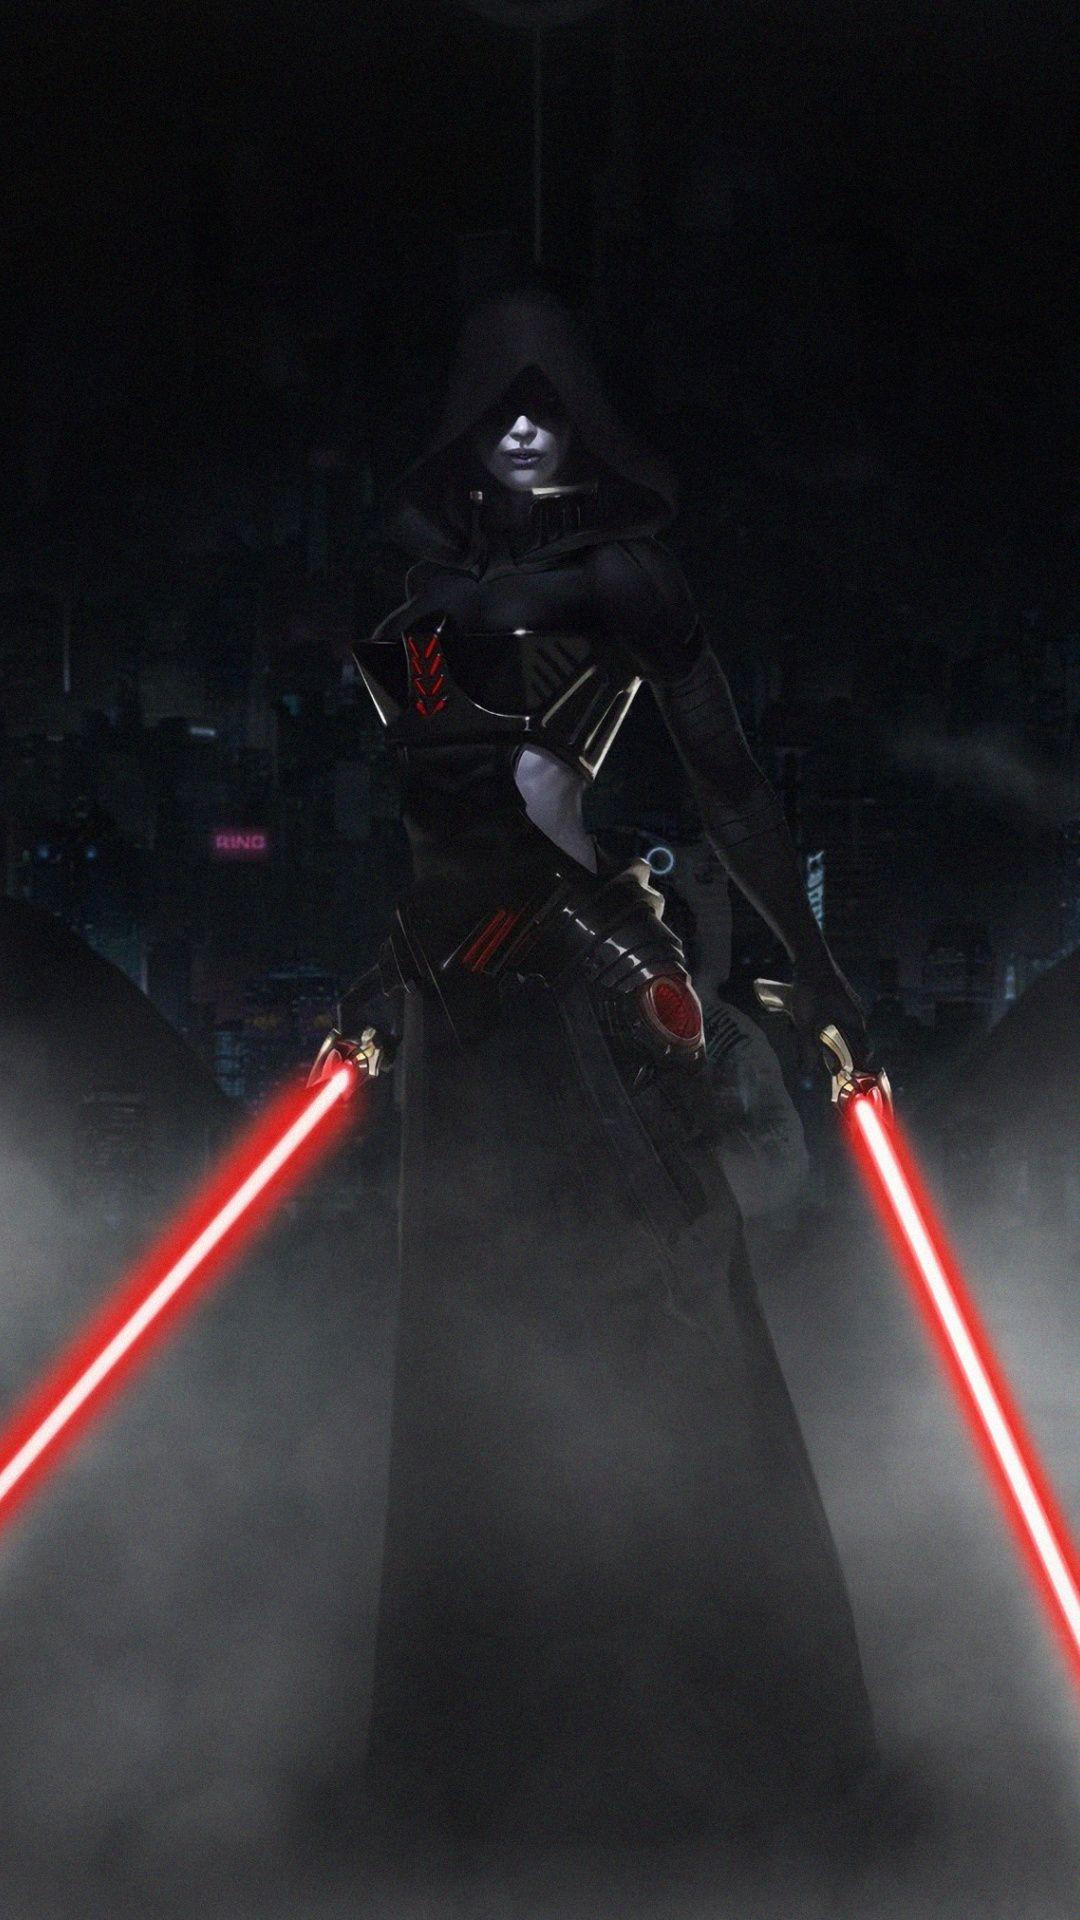 1080x1920 Girl In Hood Dark Star Wars Wallpaper Star Wars Wallpaper Star Wars Star Wars Art